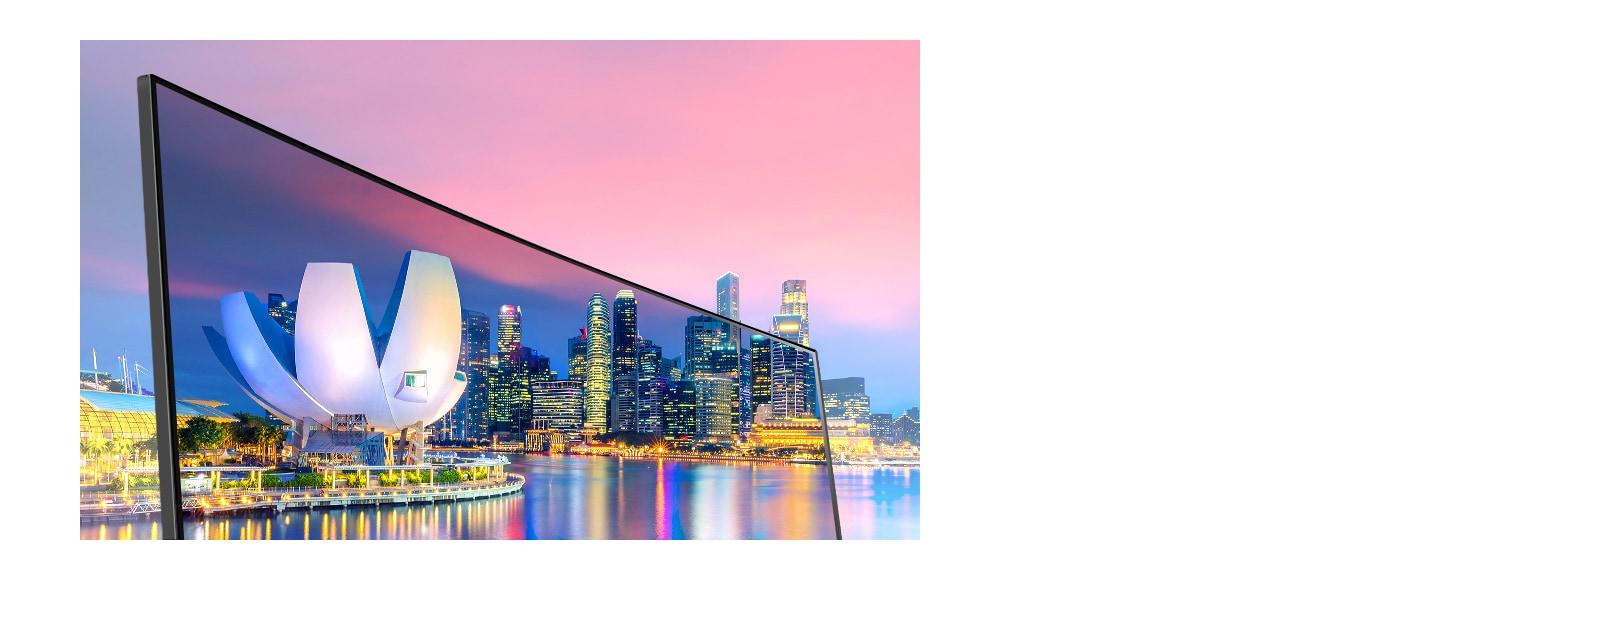 IPS עם sRGB 99% (טיפוסי): צבעים נאמנים למציאות וזווית צפייה רחבה יותר.